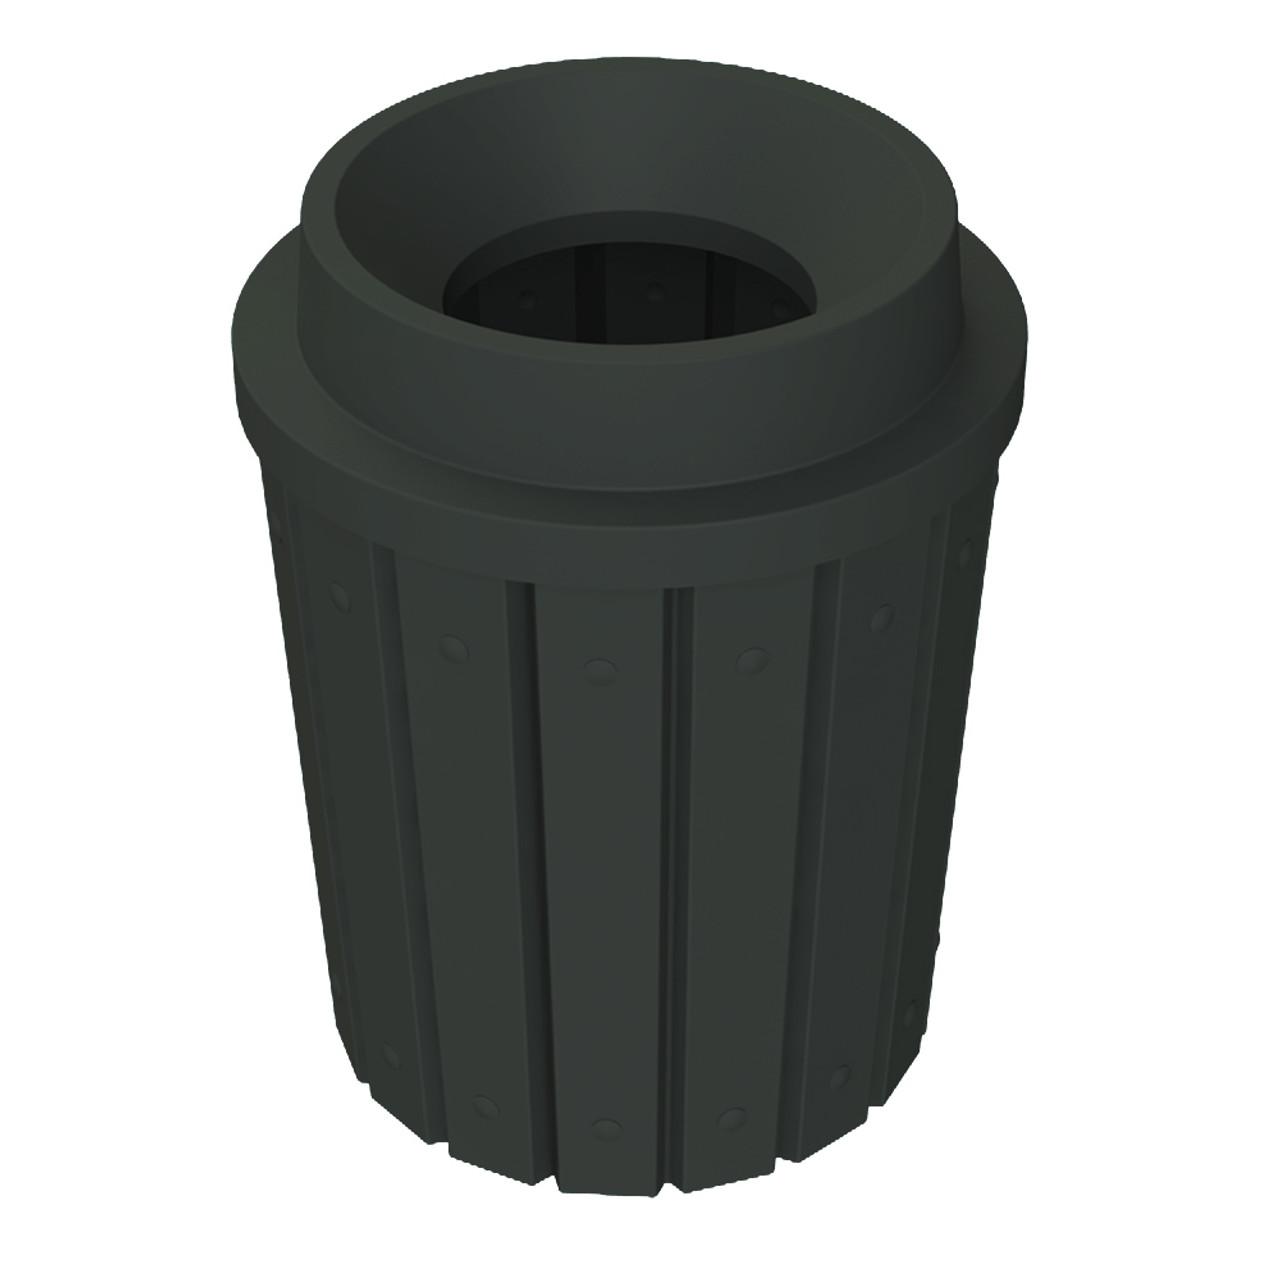 42 Gallon Heavy Duty Funnel Top Trash Can S8286A-02 BLACK